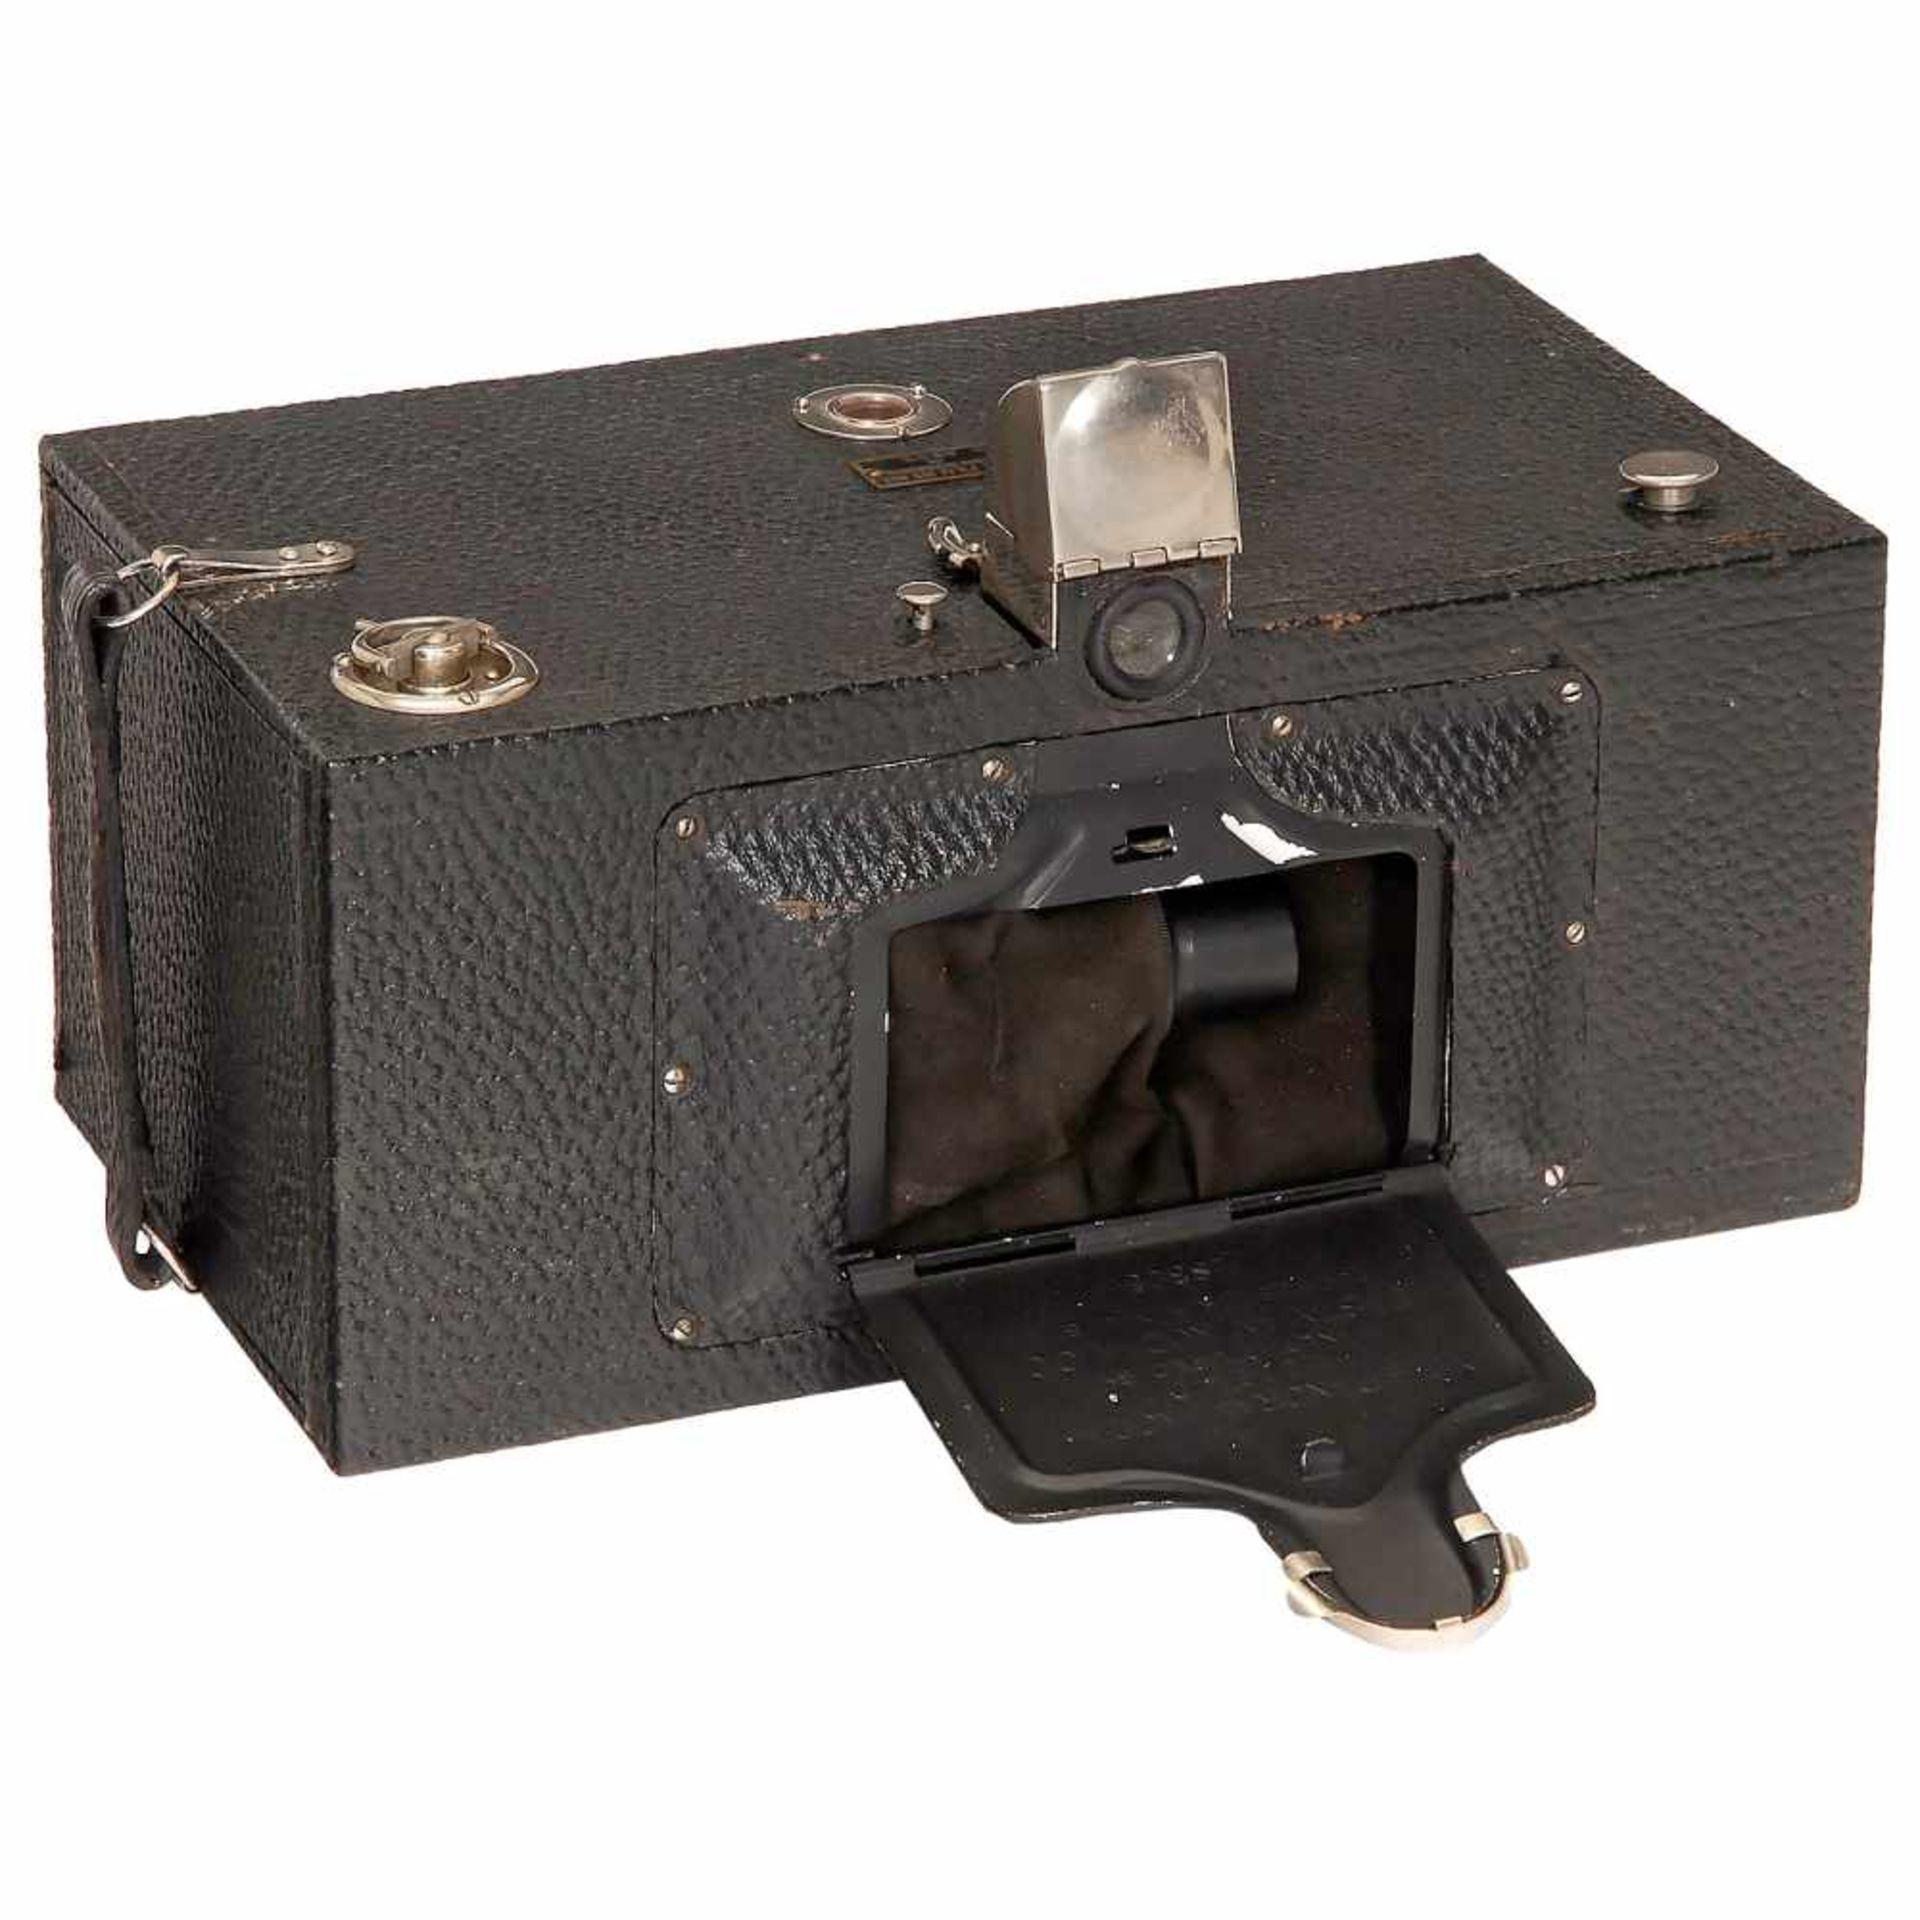 No. 4 Panoram Kodak Model D, c. 1900Eastman Kodak, Rochester, USA. Size 3 ½ x 12 in. on film type